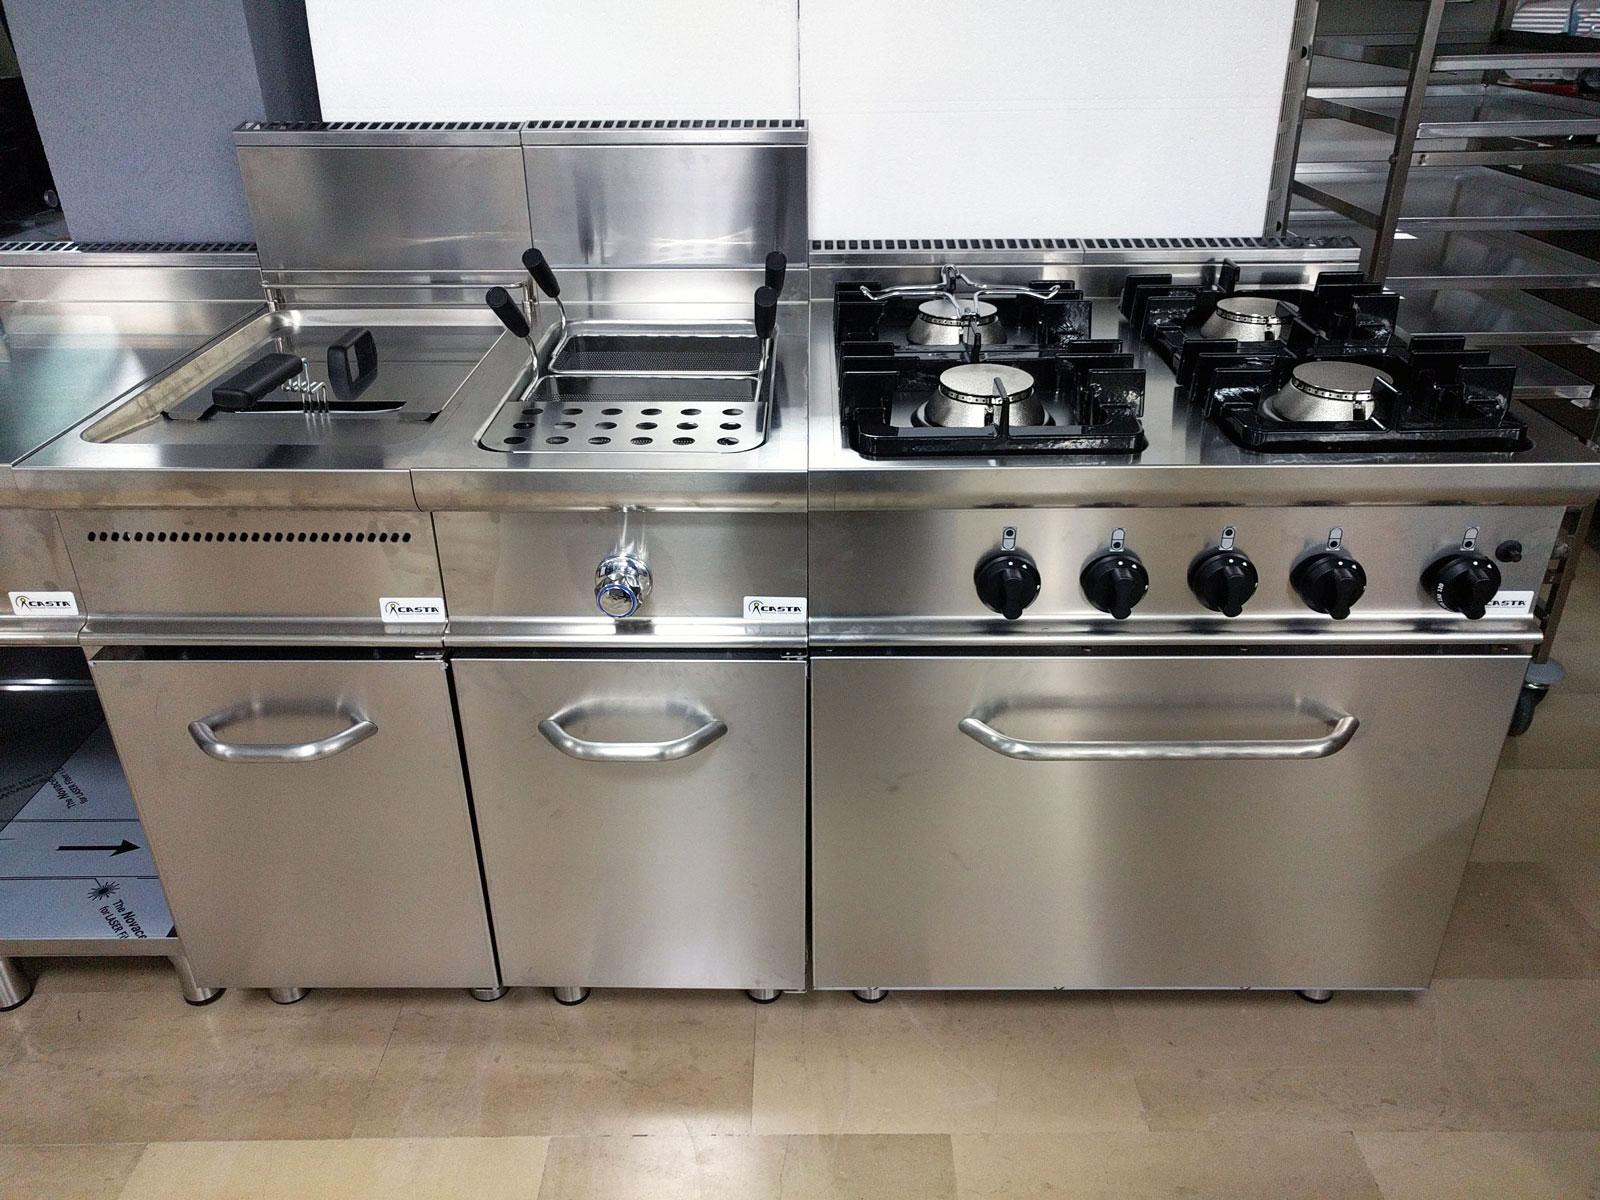 Cucine a gas Linea 70 - Centro Vetrine 2